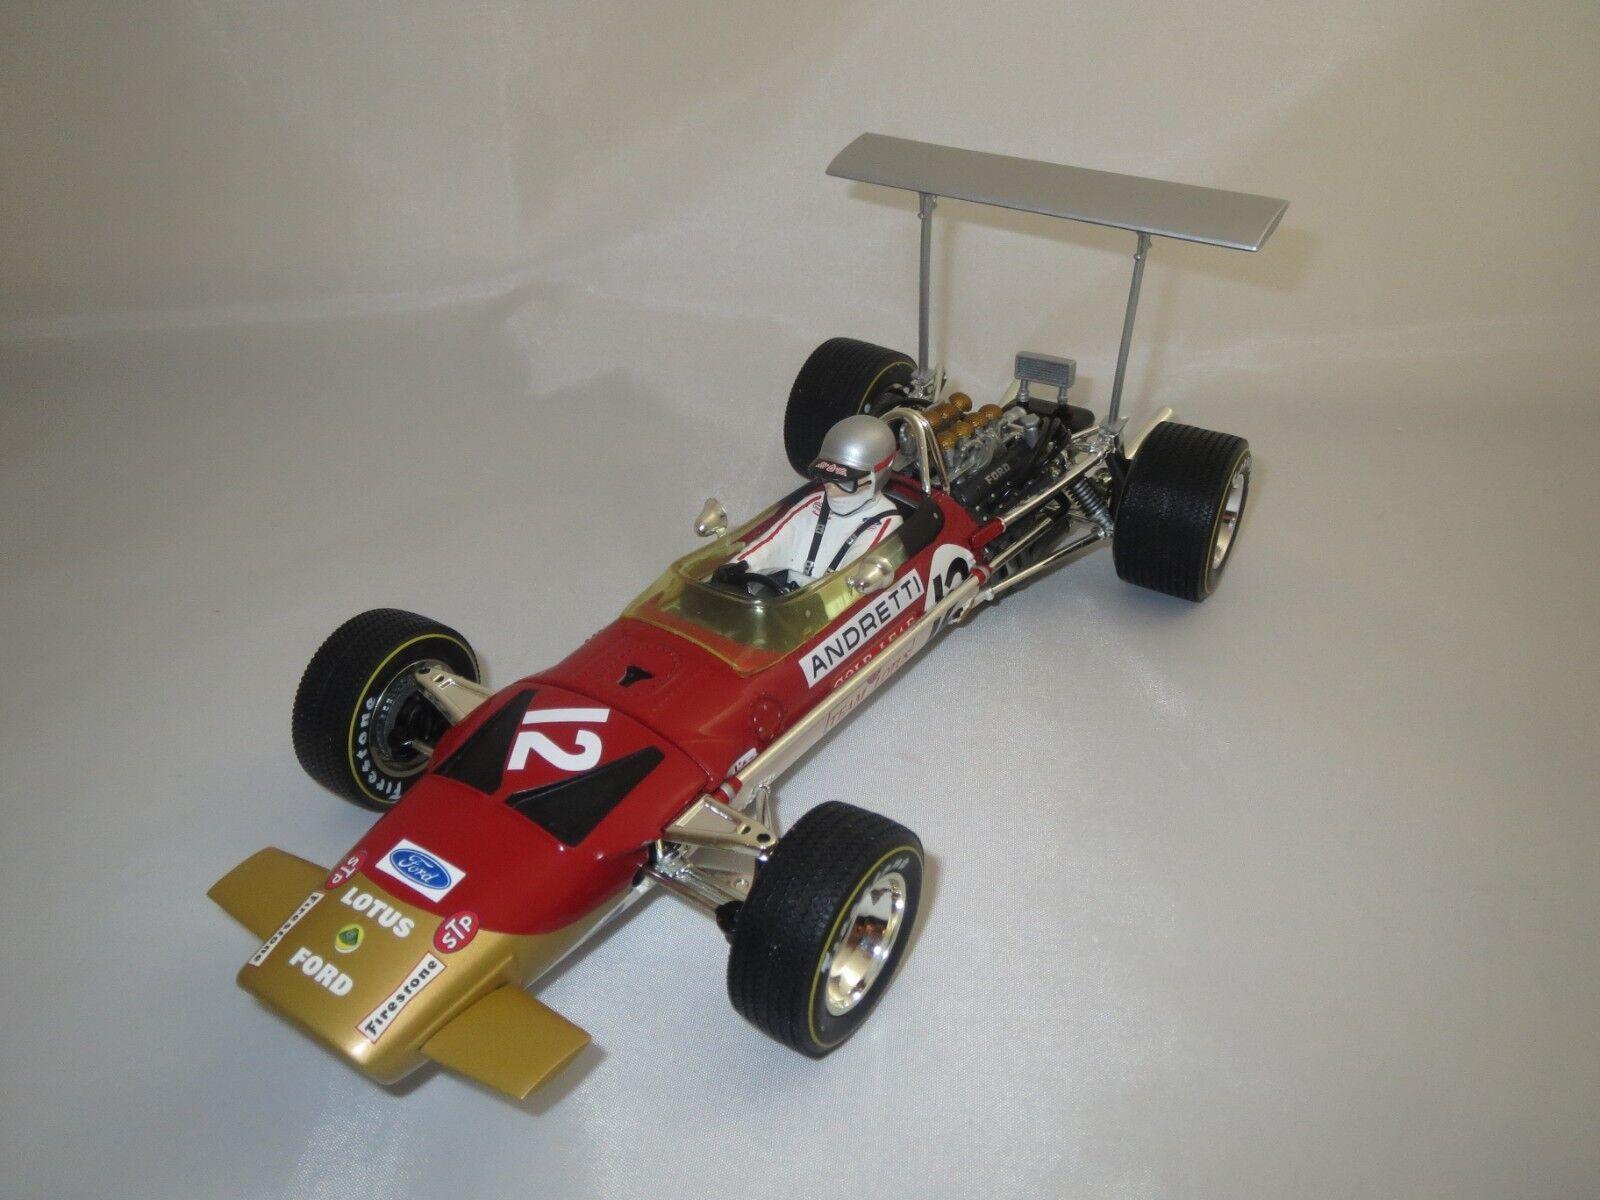 Quartzo Lotus 49b U.S.A G.P.  1968  Mario Andretti 1 18 sans emballage